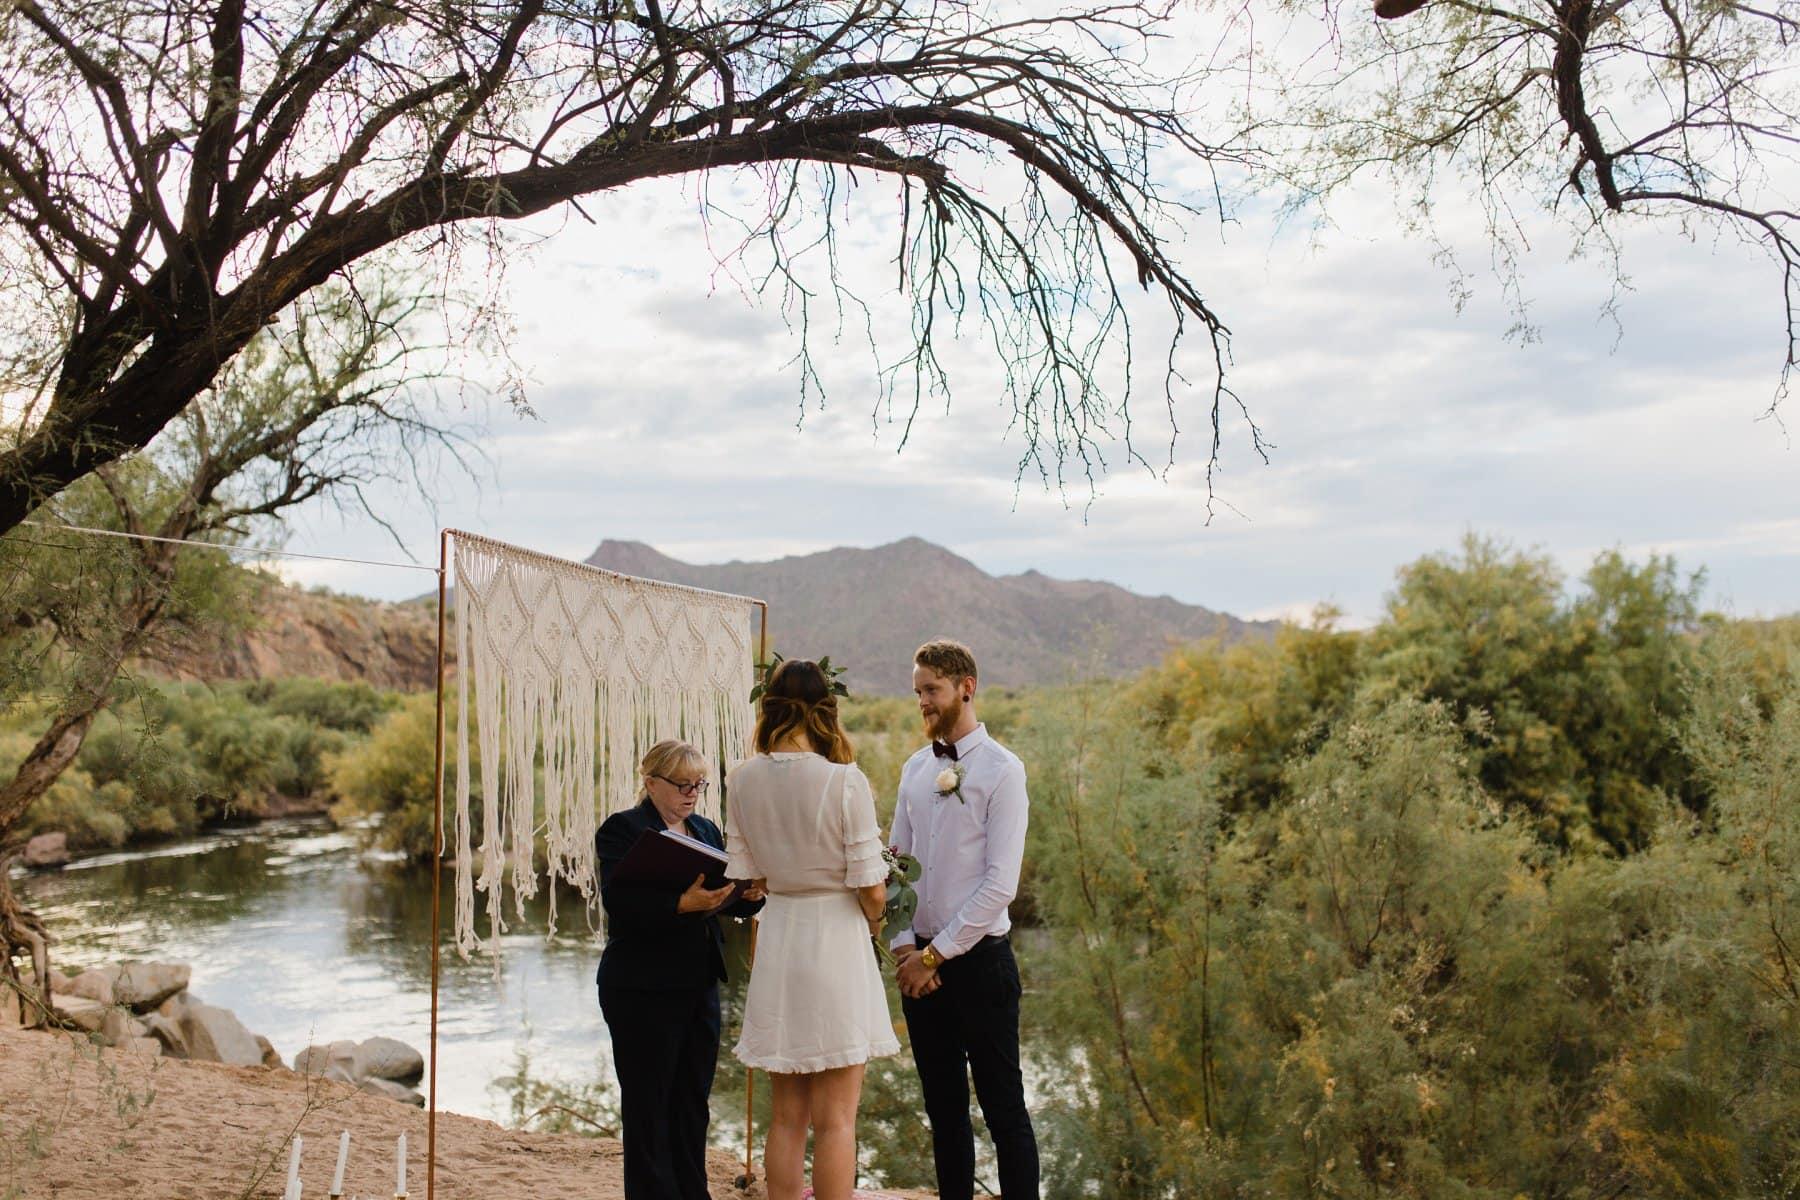 scenic outdoor ceremony at Salt River Arizona